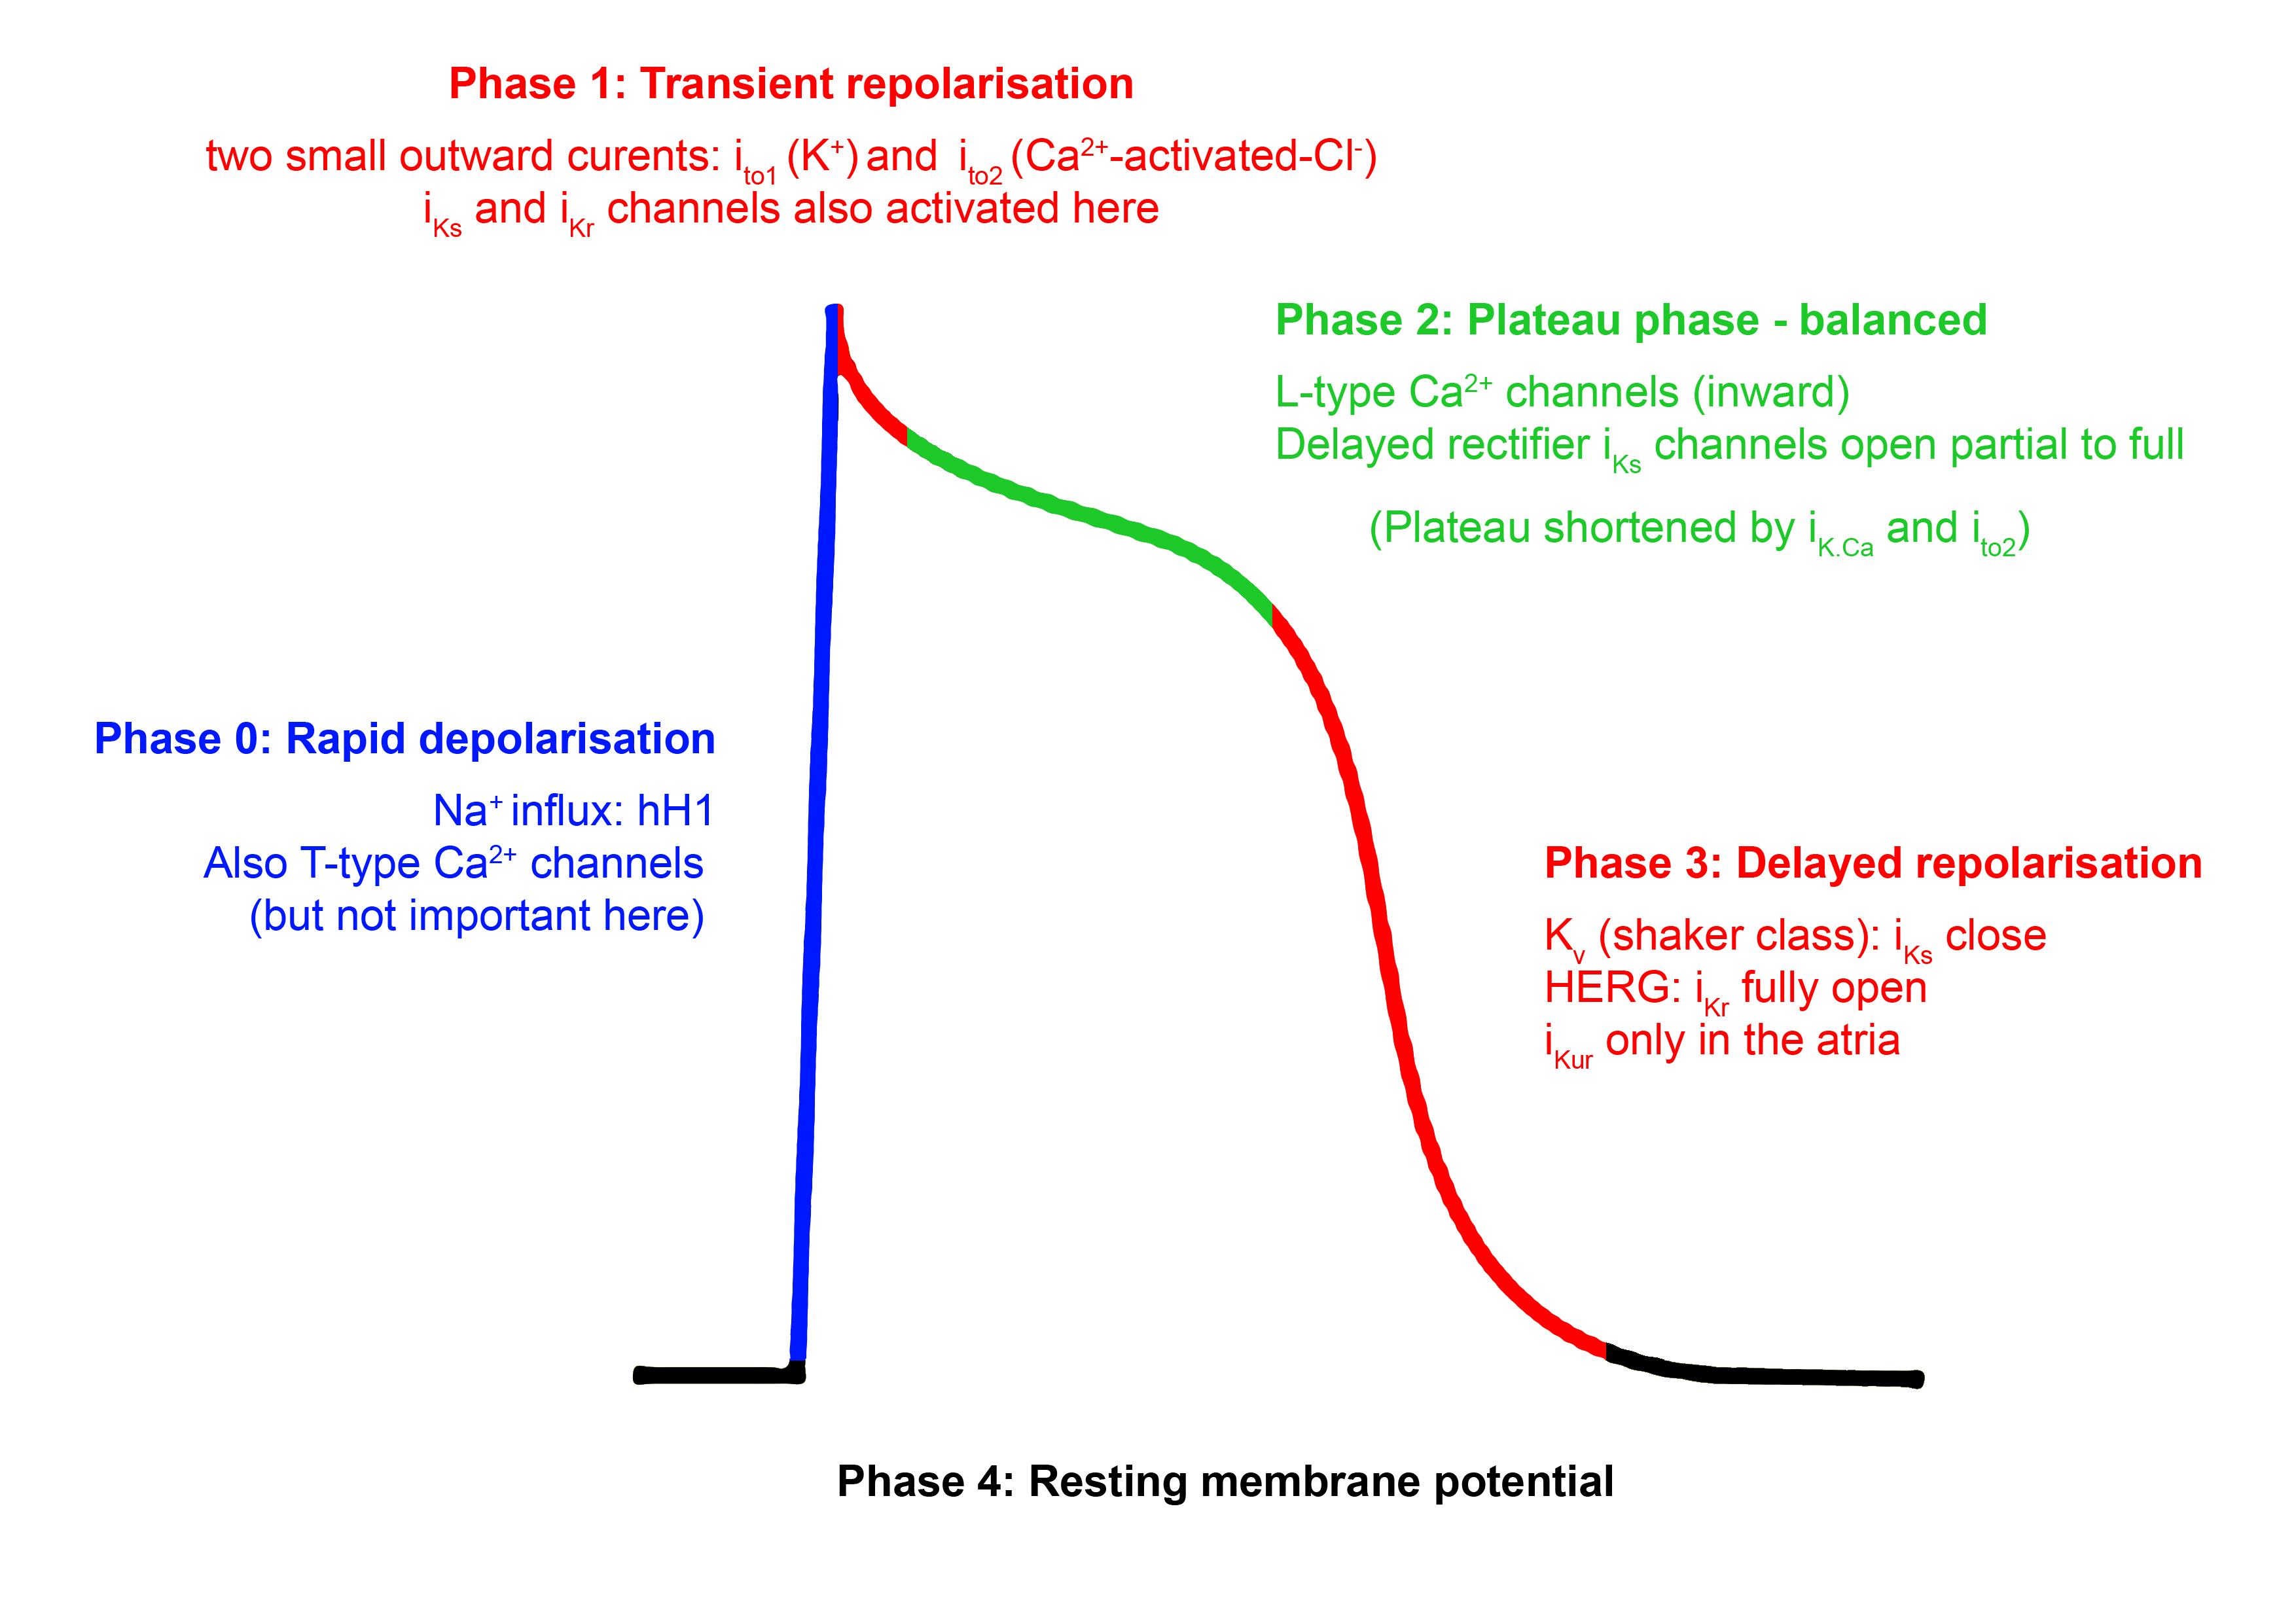 Atrial depolarisation